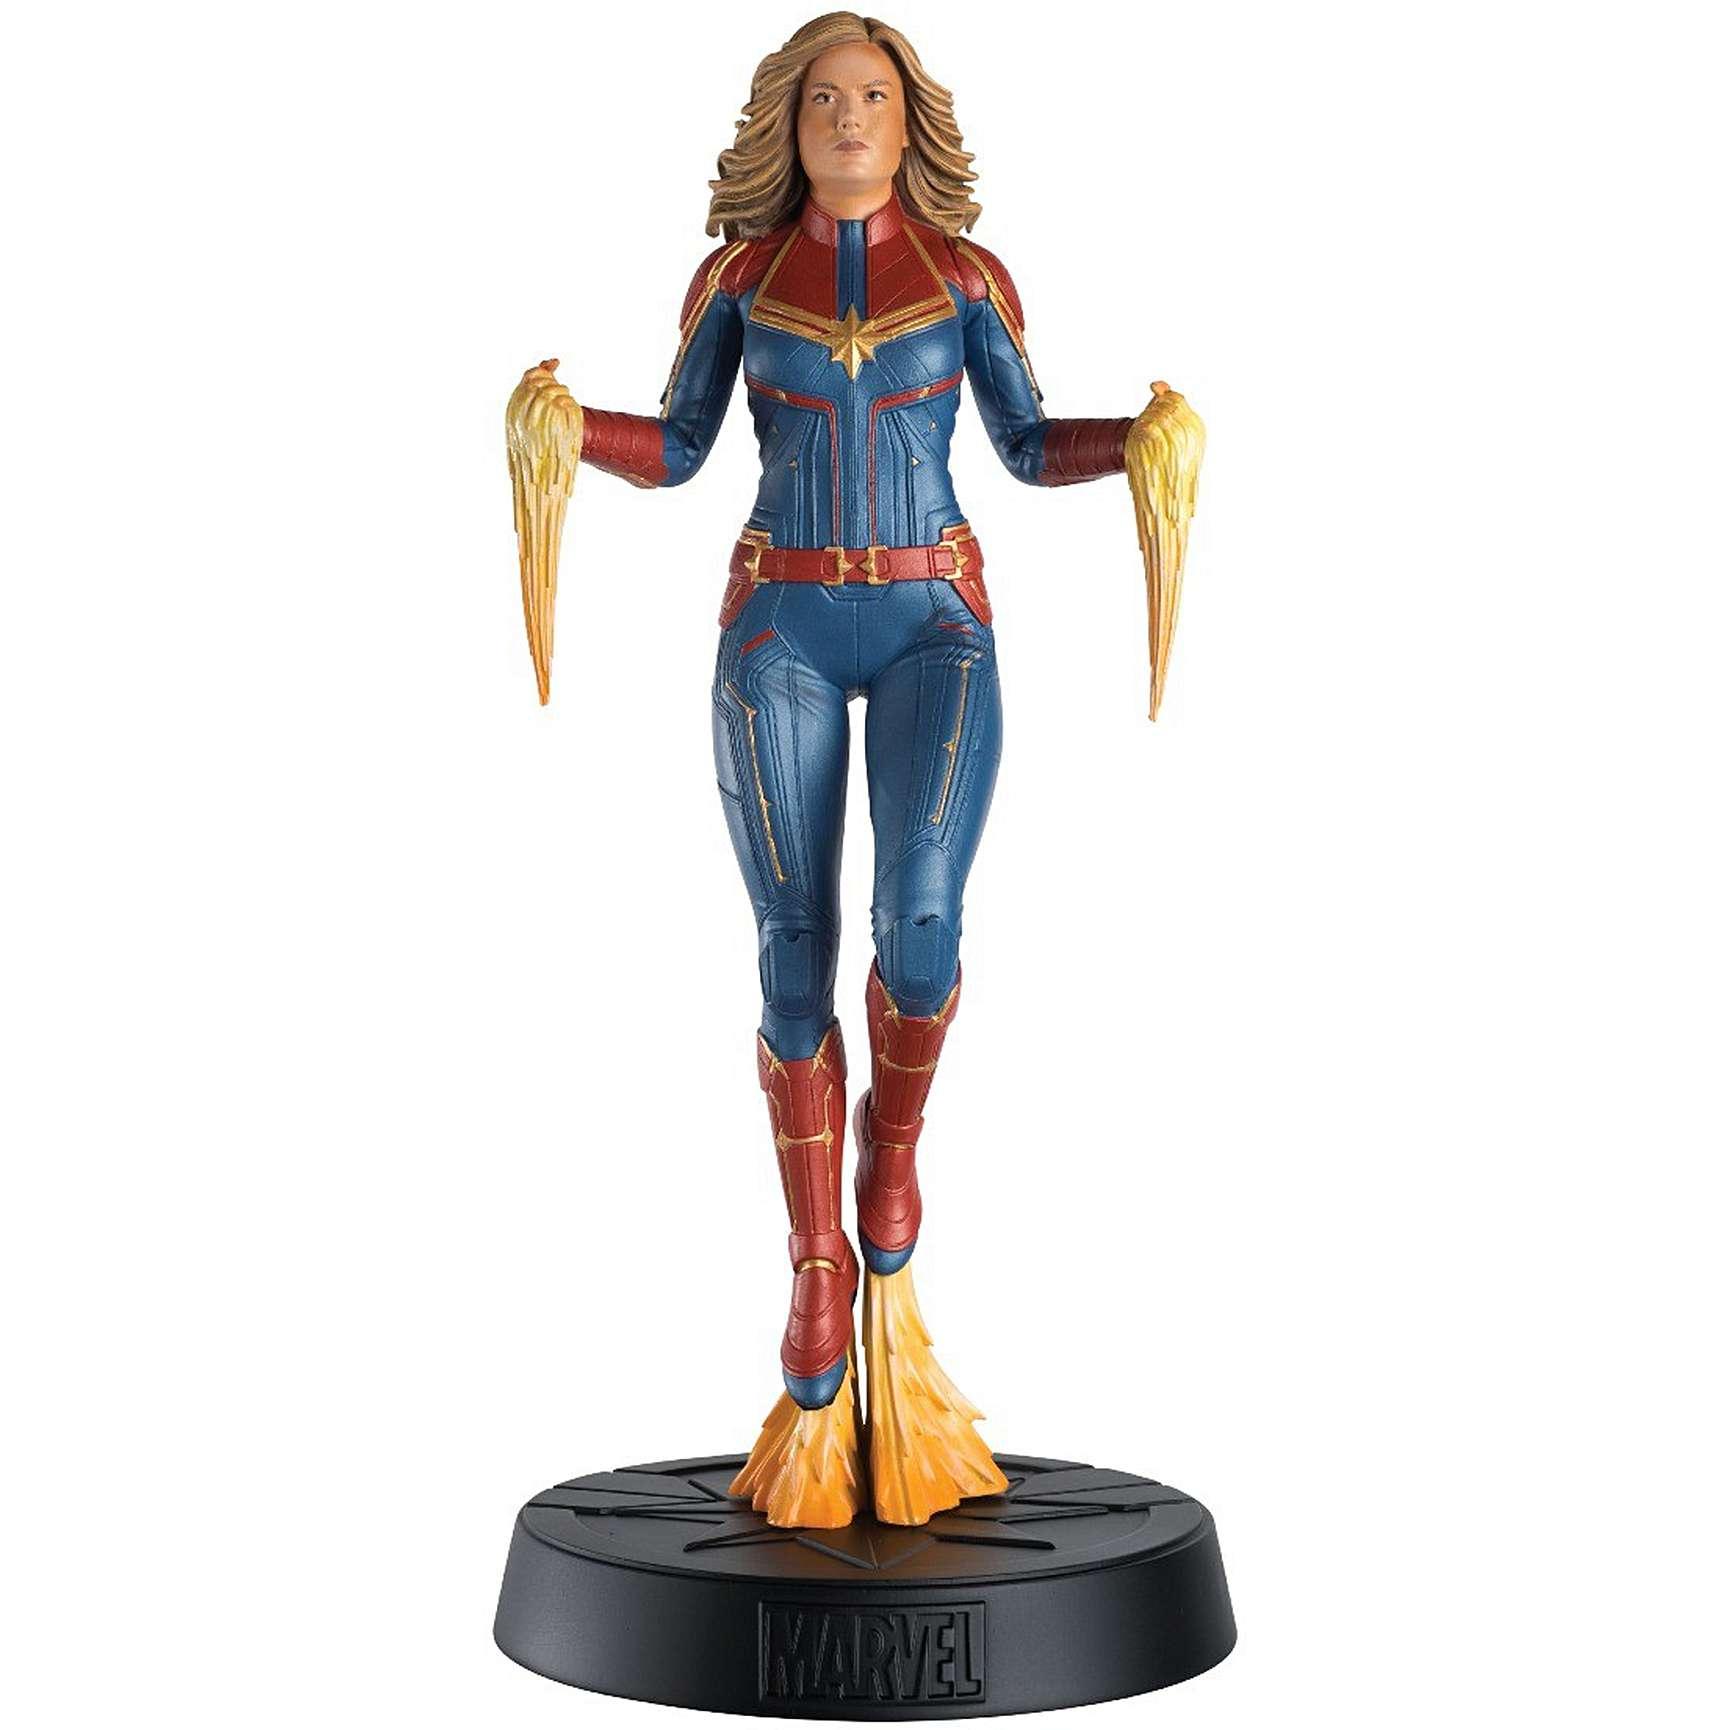 Figura de Capitana Marvel de 35 cm